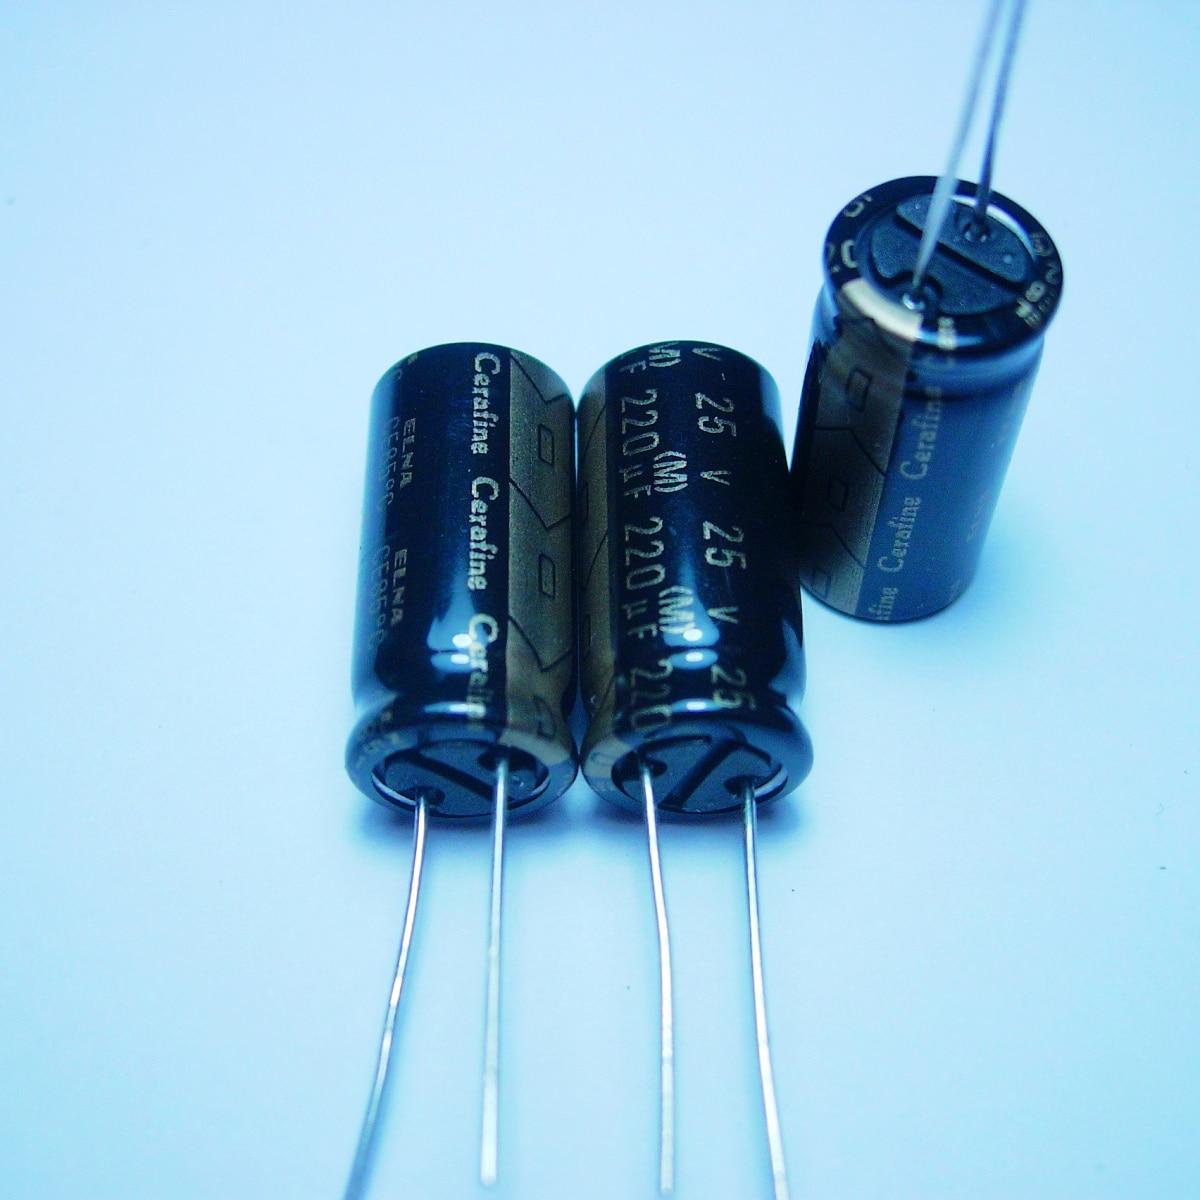 10pcs/20pcs ELNA cerafine 25v220uf black audio condenser copper audio super capacitor electrolytic capacitors free shipping 1